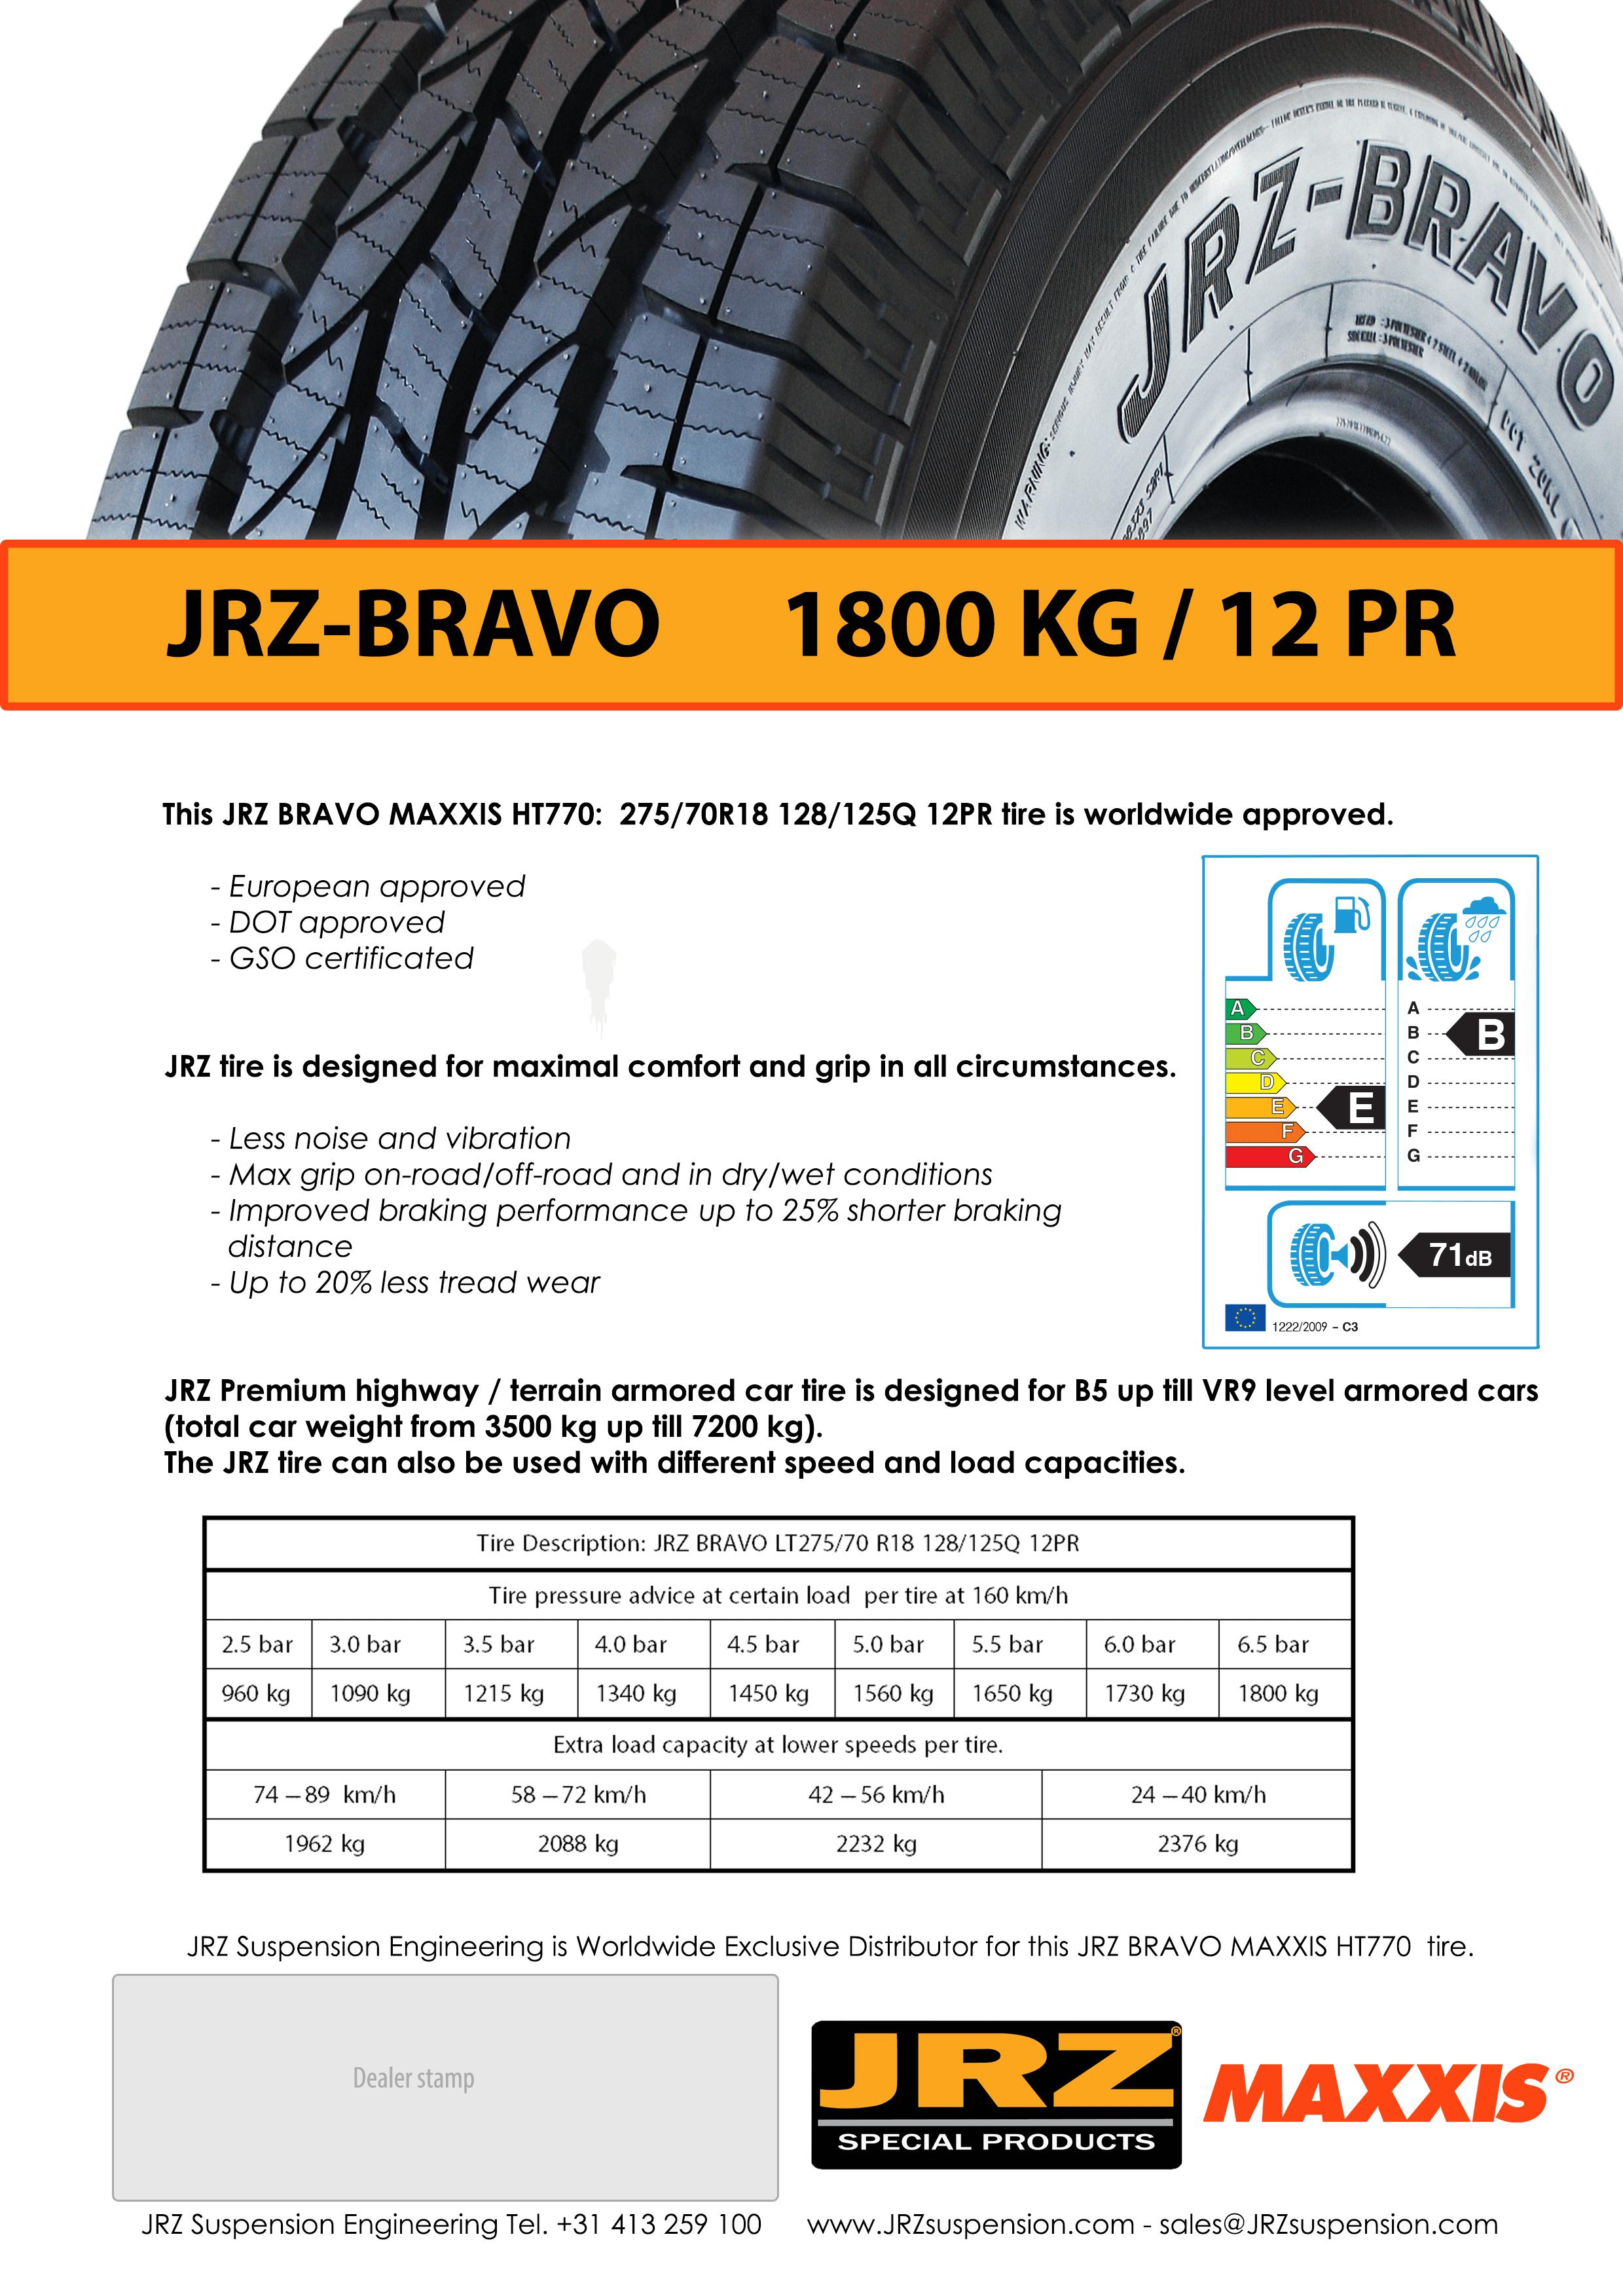 Jrz Bravo Maxxis Ht770 Jrz Suspension Engineering